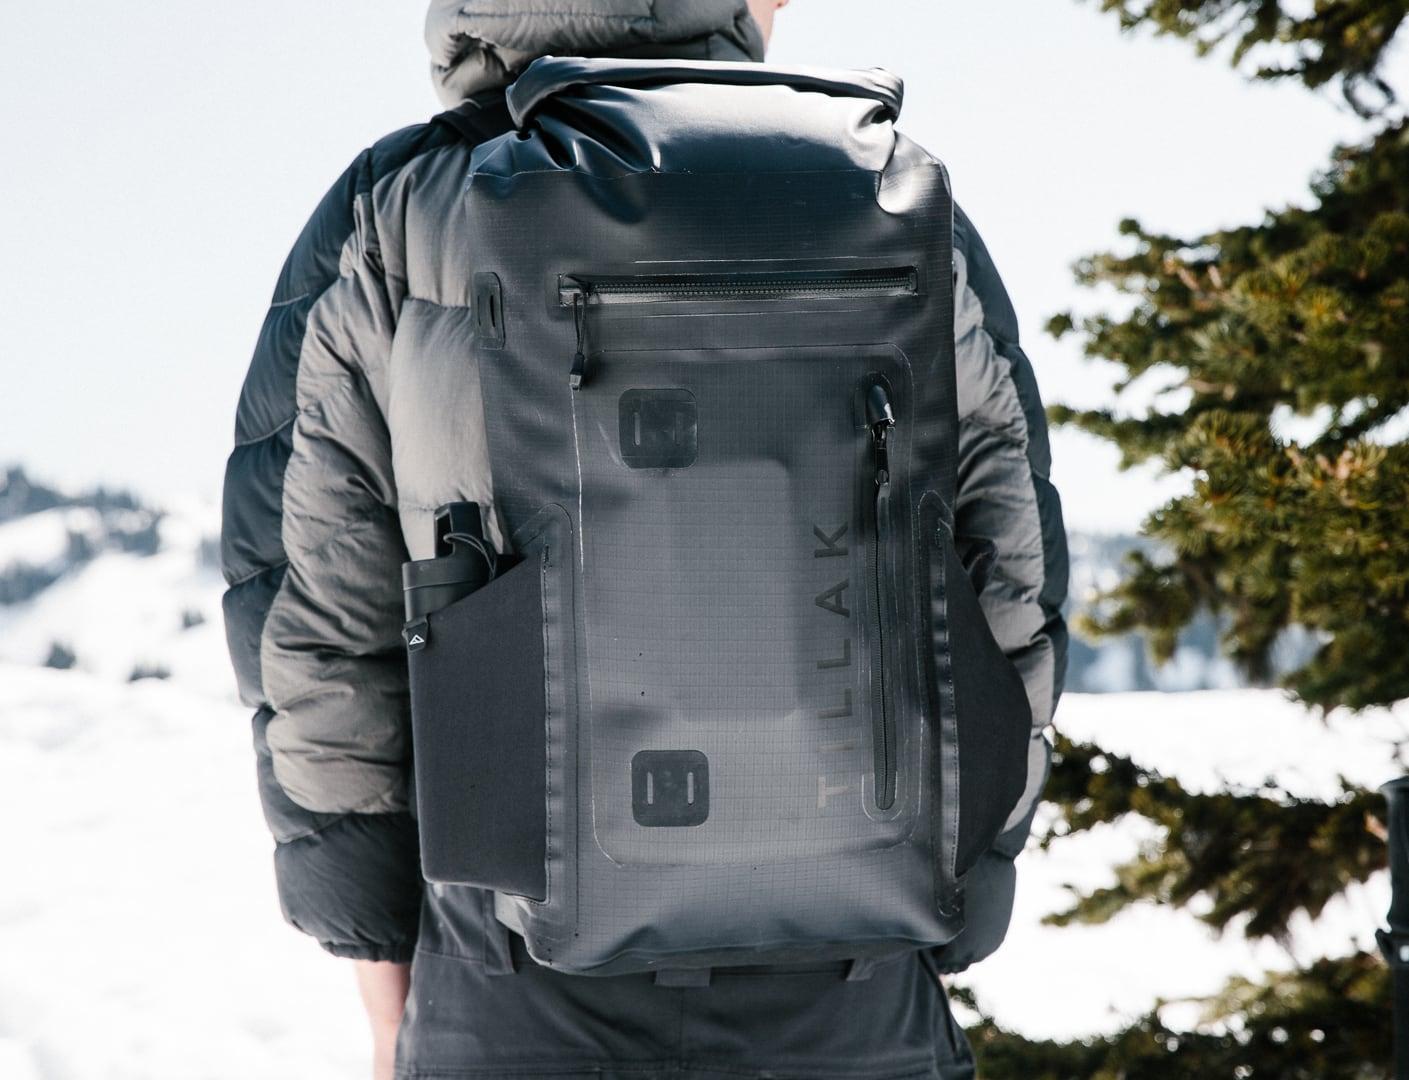 Tillak's Siletz Modular Carry System